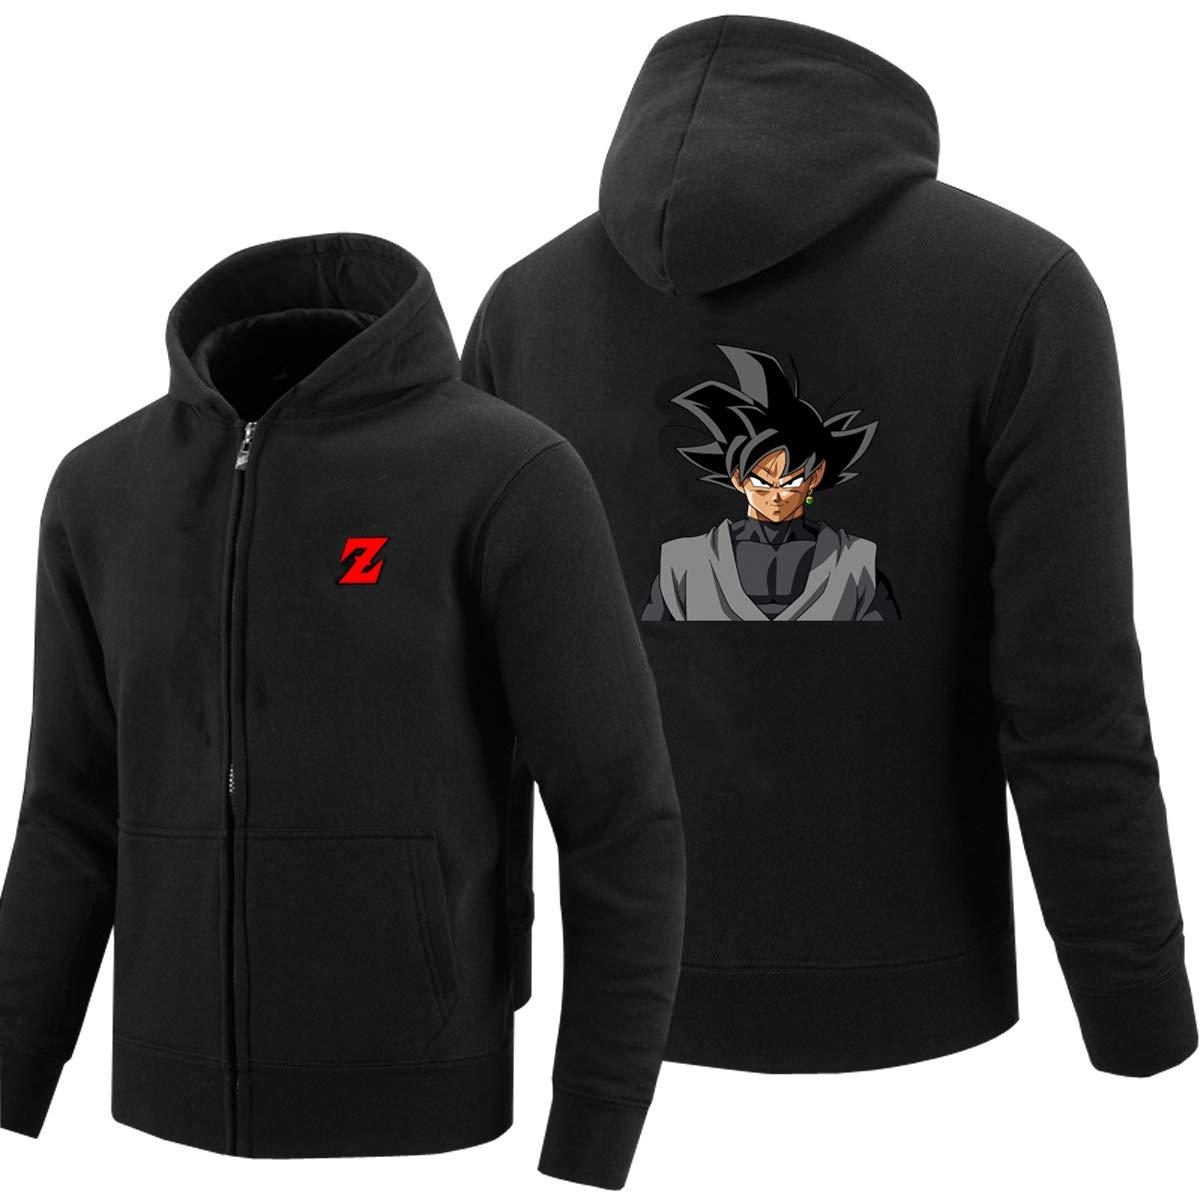 ELEFINE Boys Mens Hoodies Cosplay Dragon Ball Z Super Saiyan Zip Son Goku Jacket